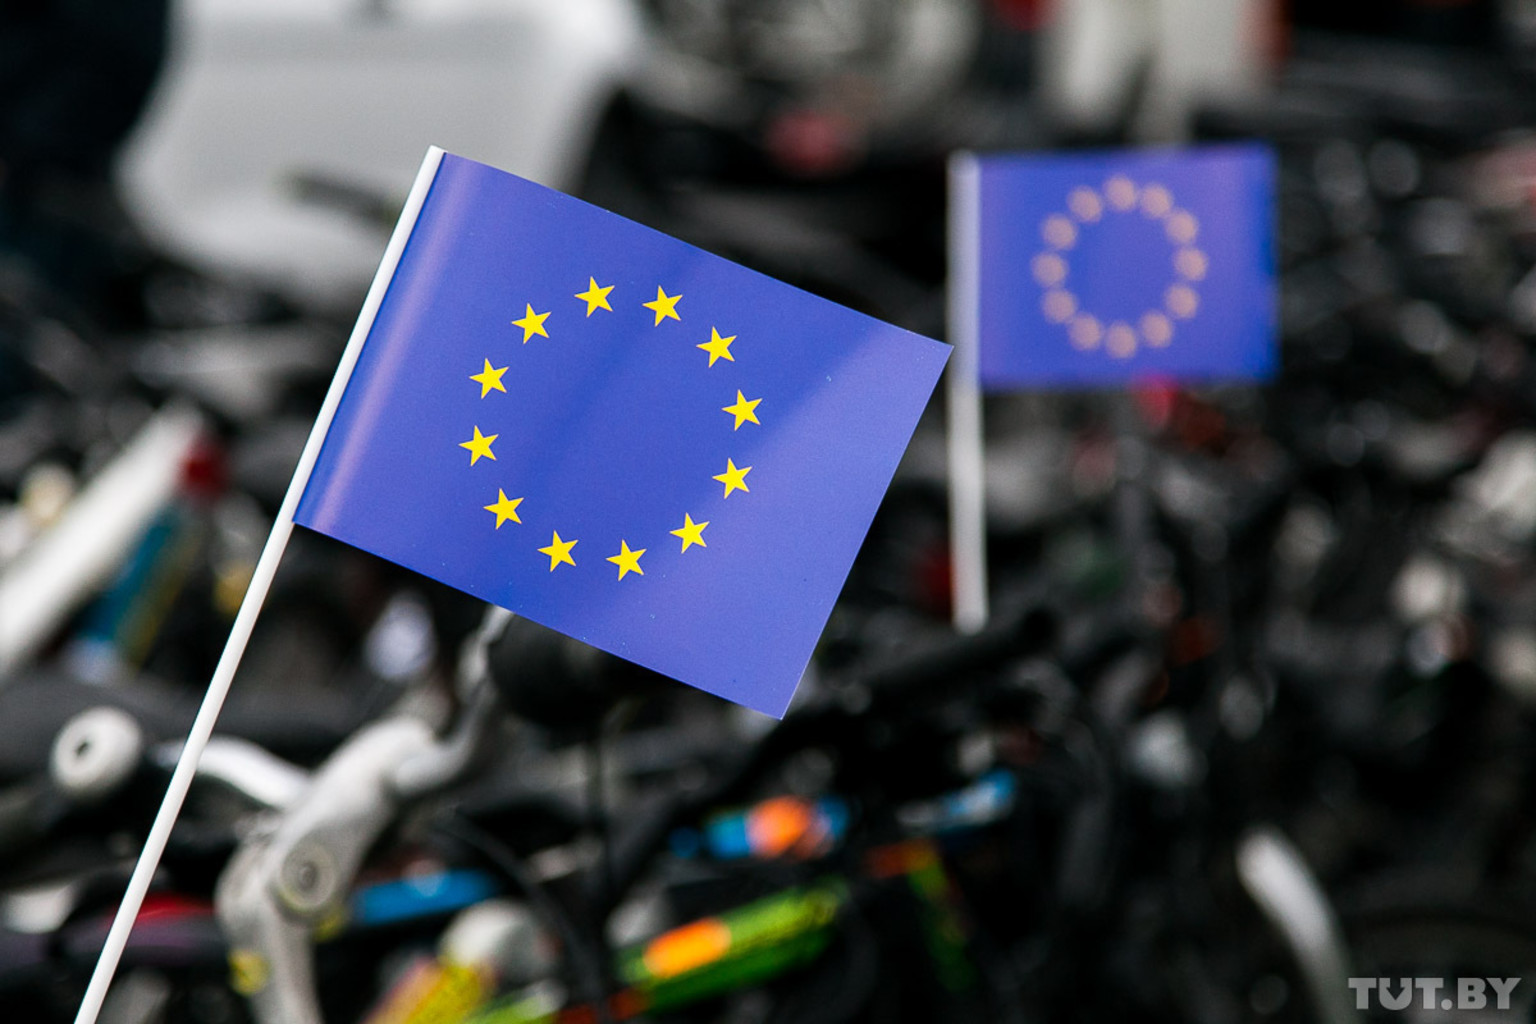 Flag evrosoyuz es 20160921 tutby phsl 9835